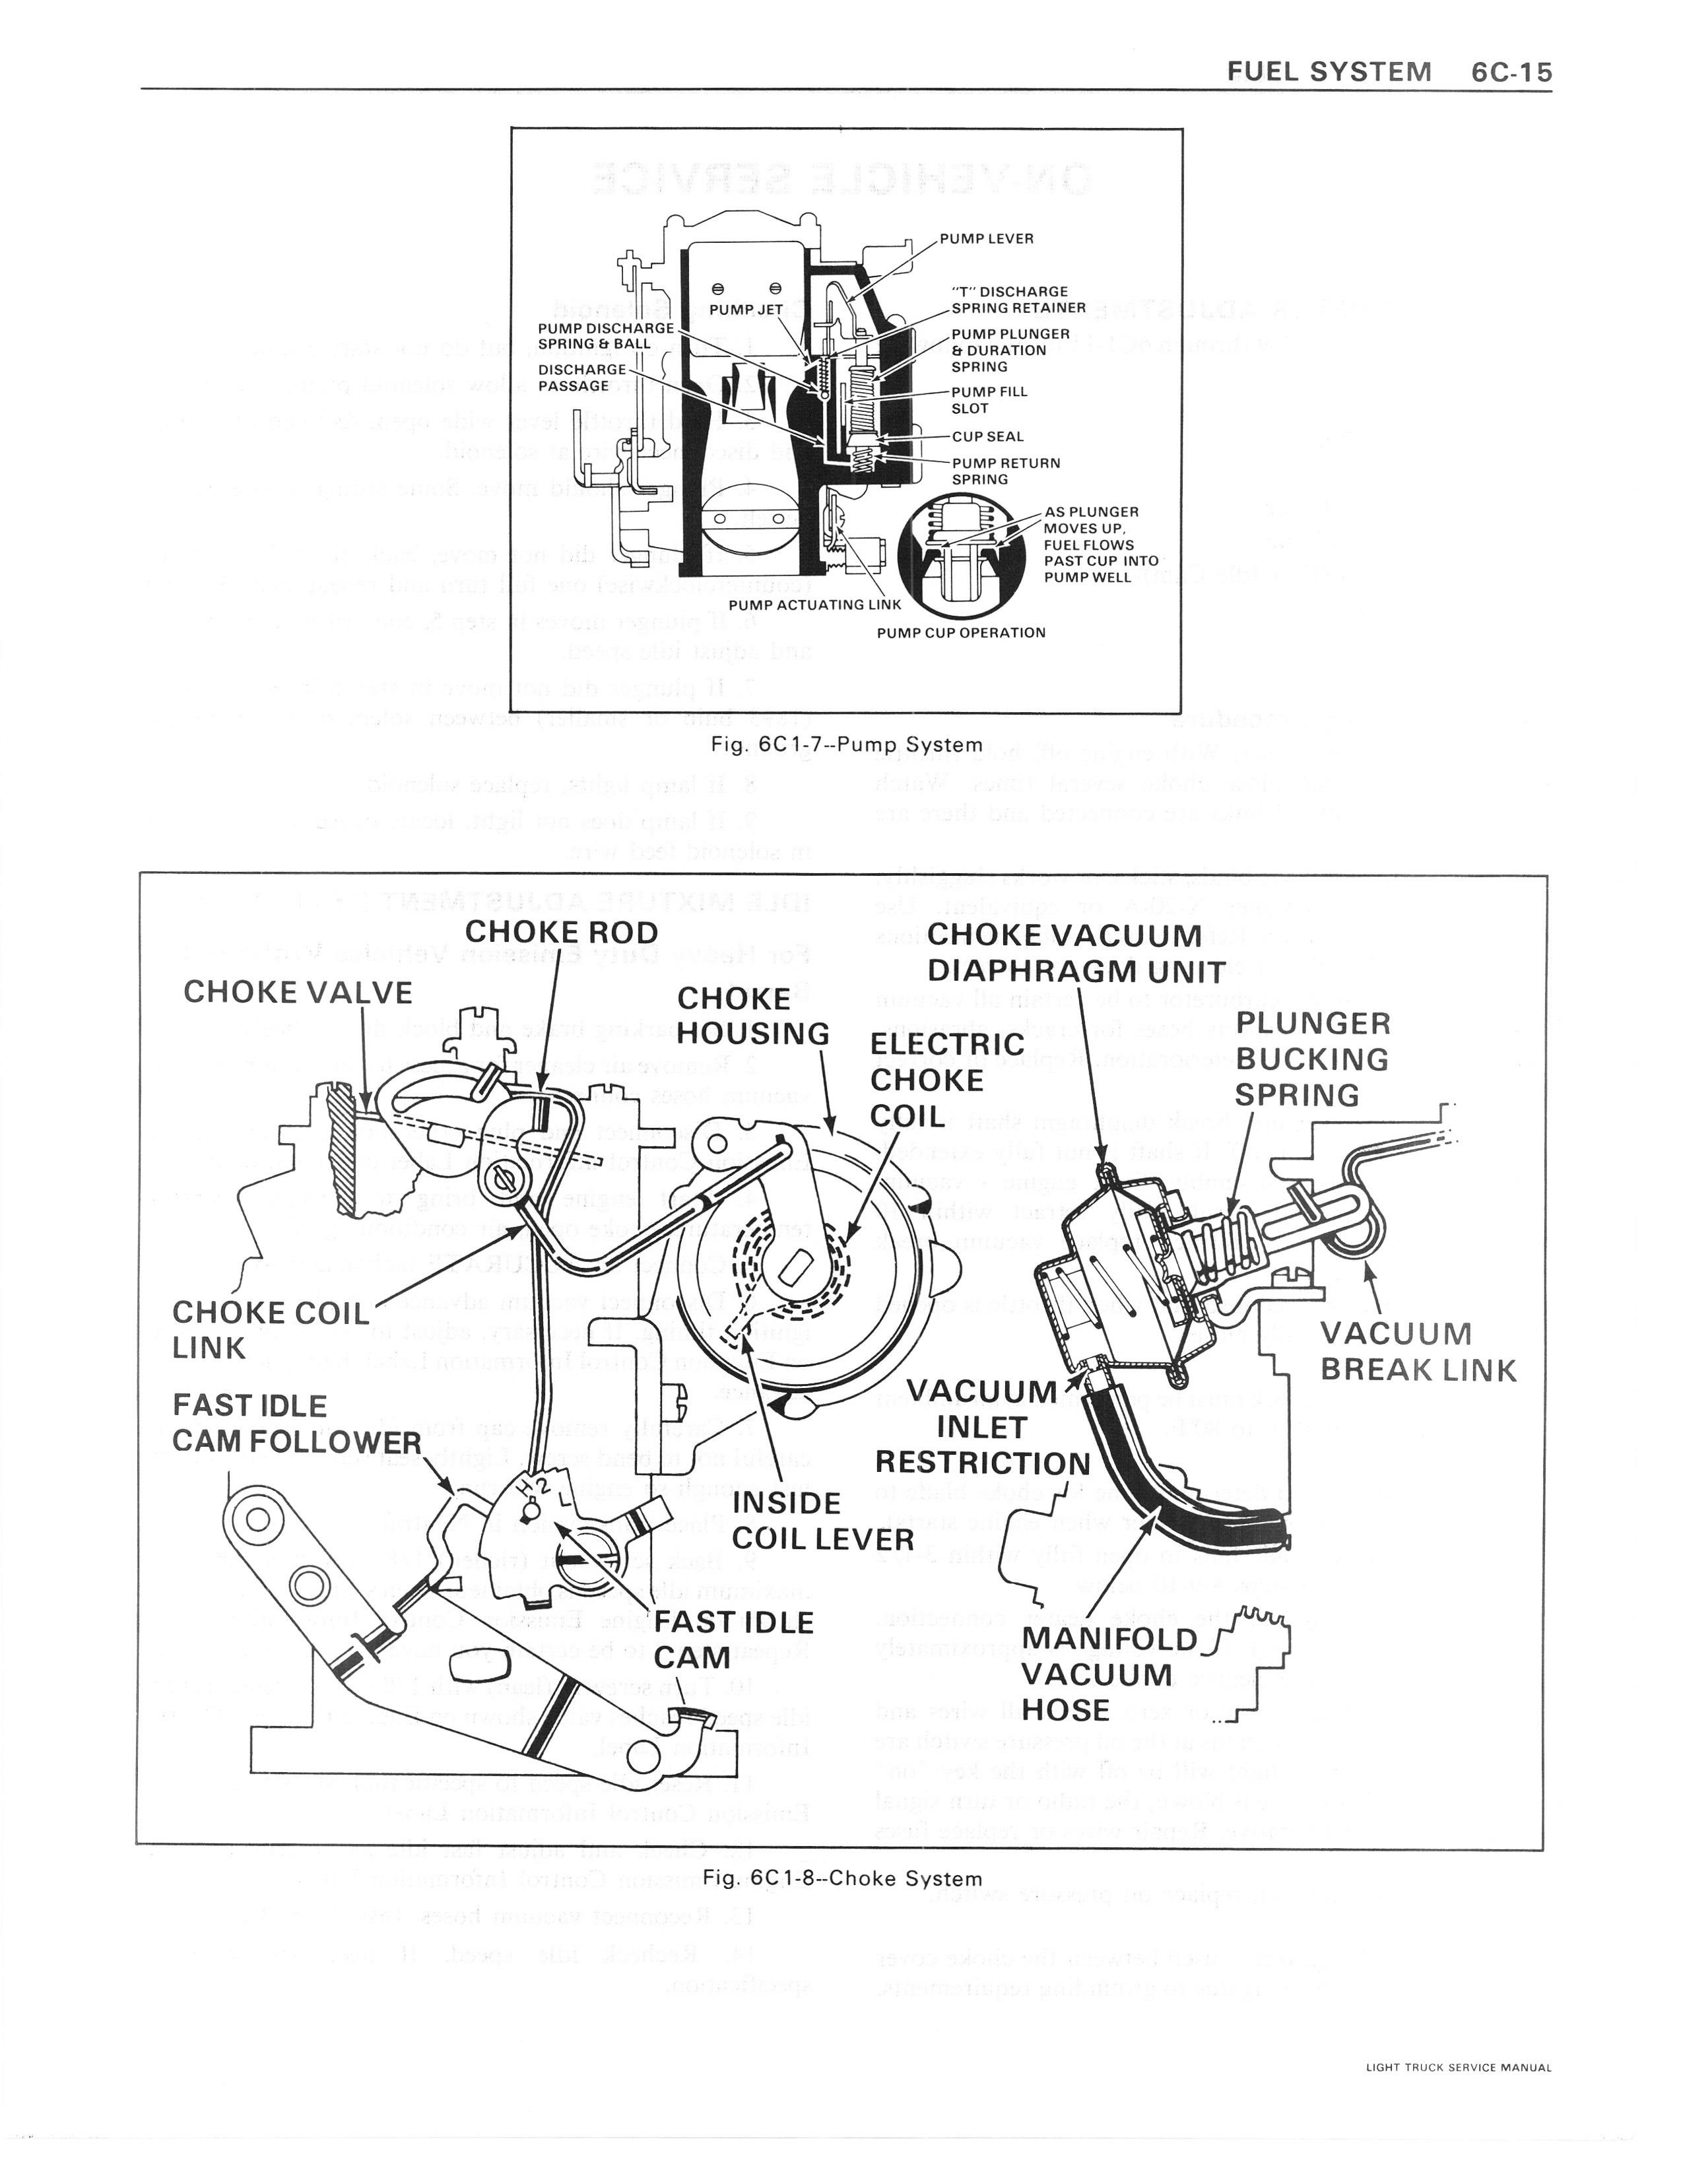 1979 gmc series 10-035 service manual   79gmc